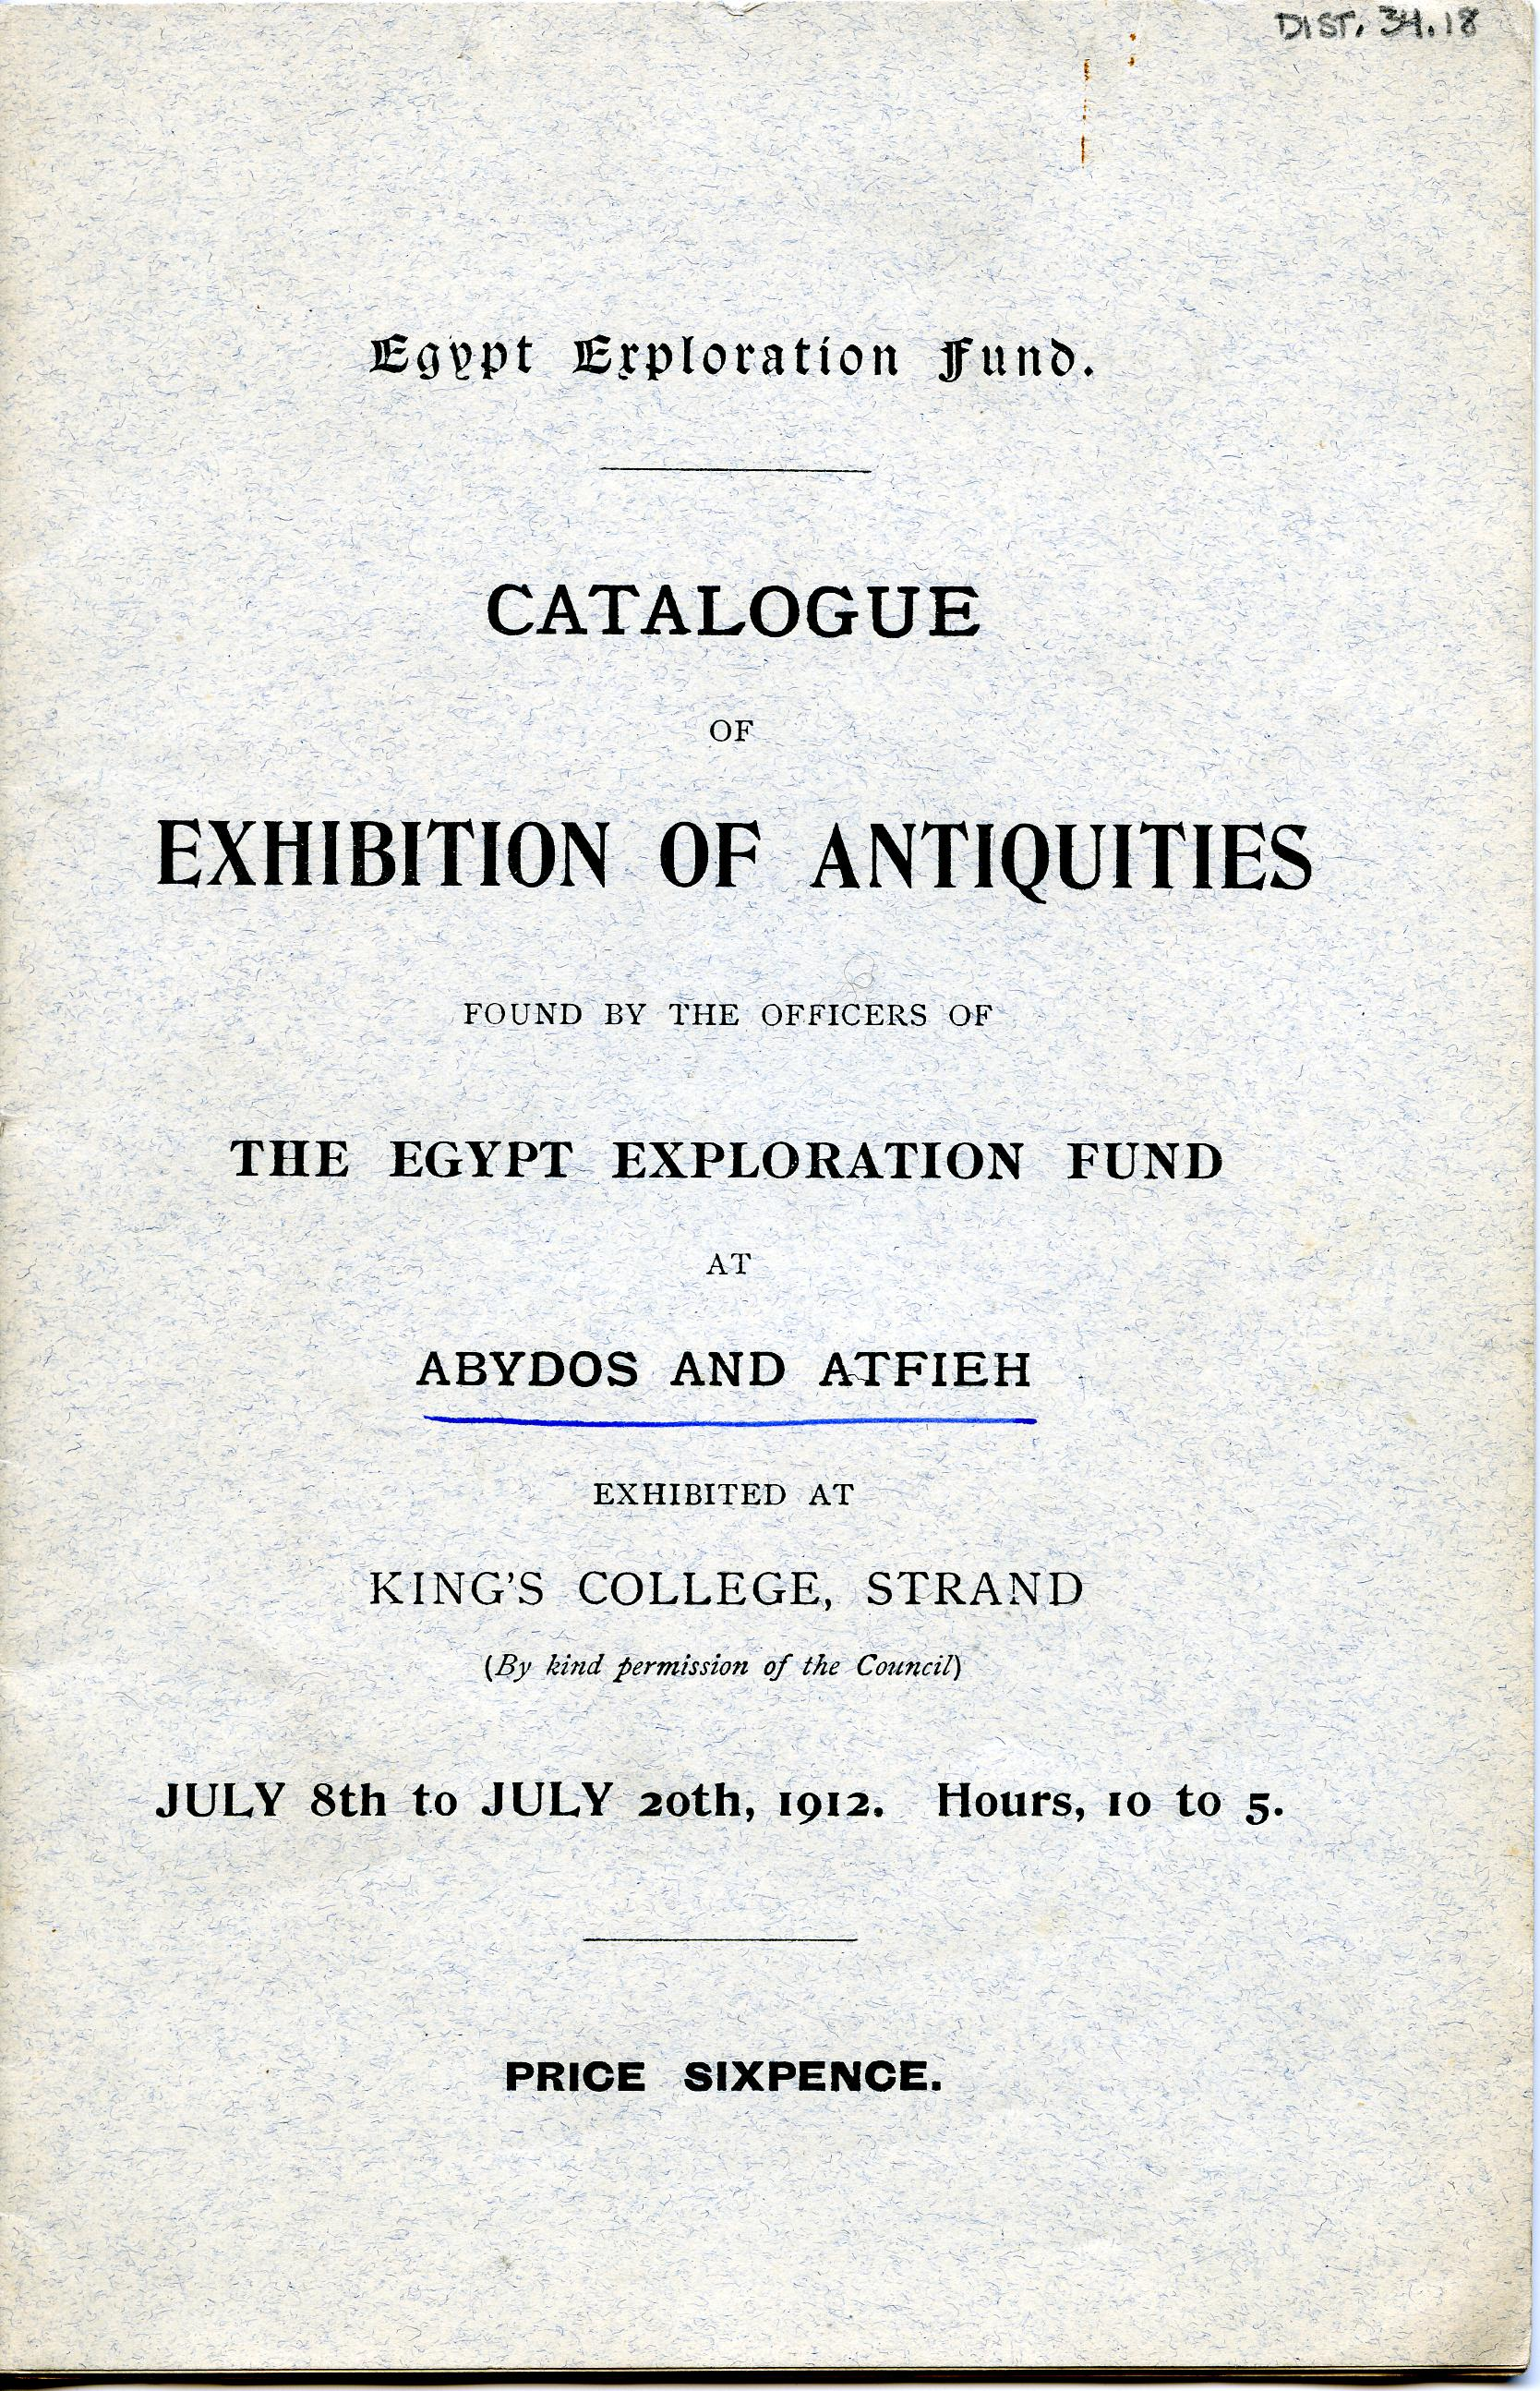 1910-11 Abydos, Atfieh DIST.34.18a